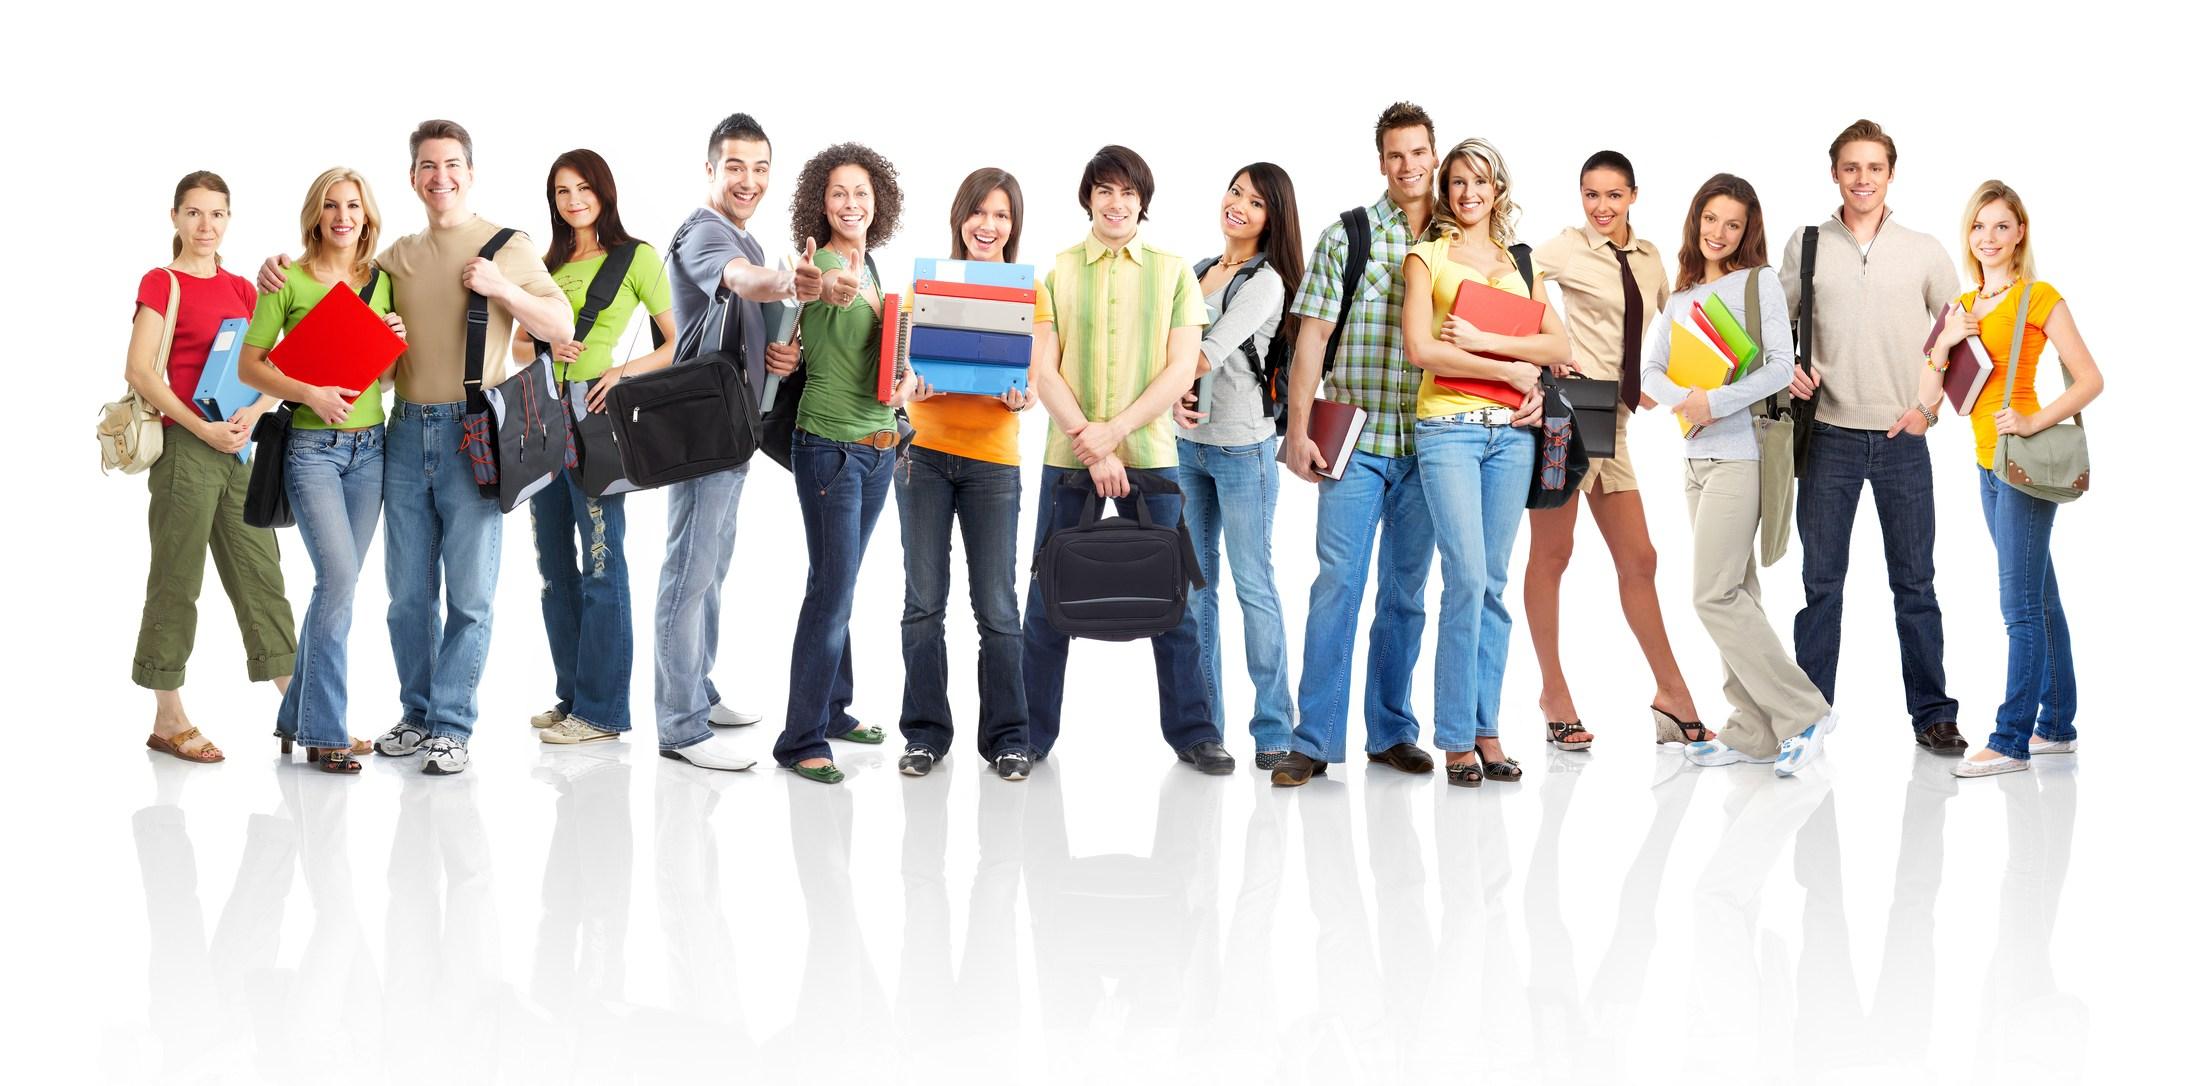 Adolescent students standing